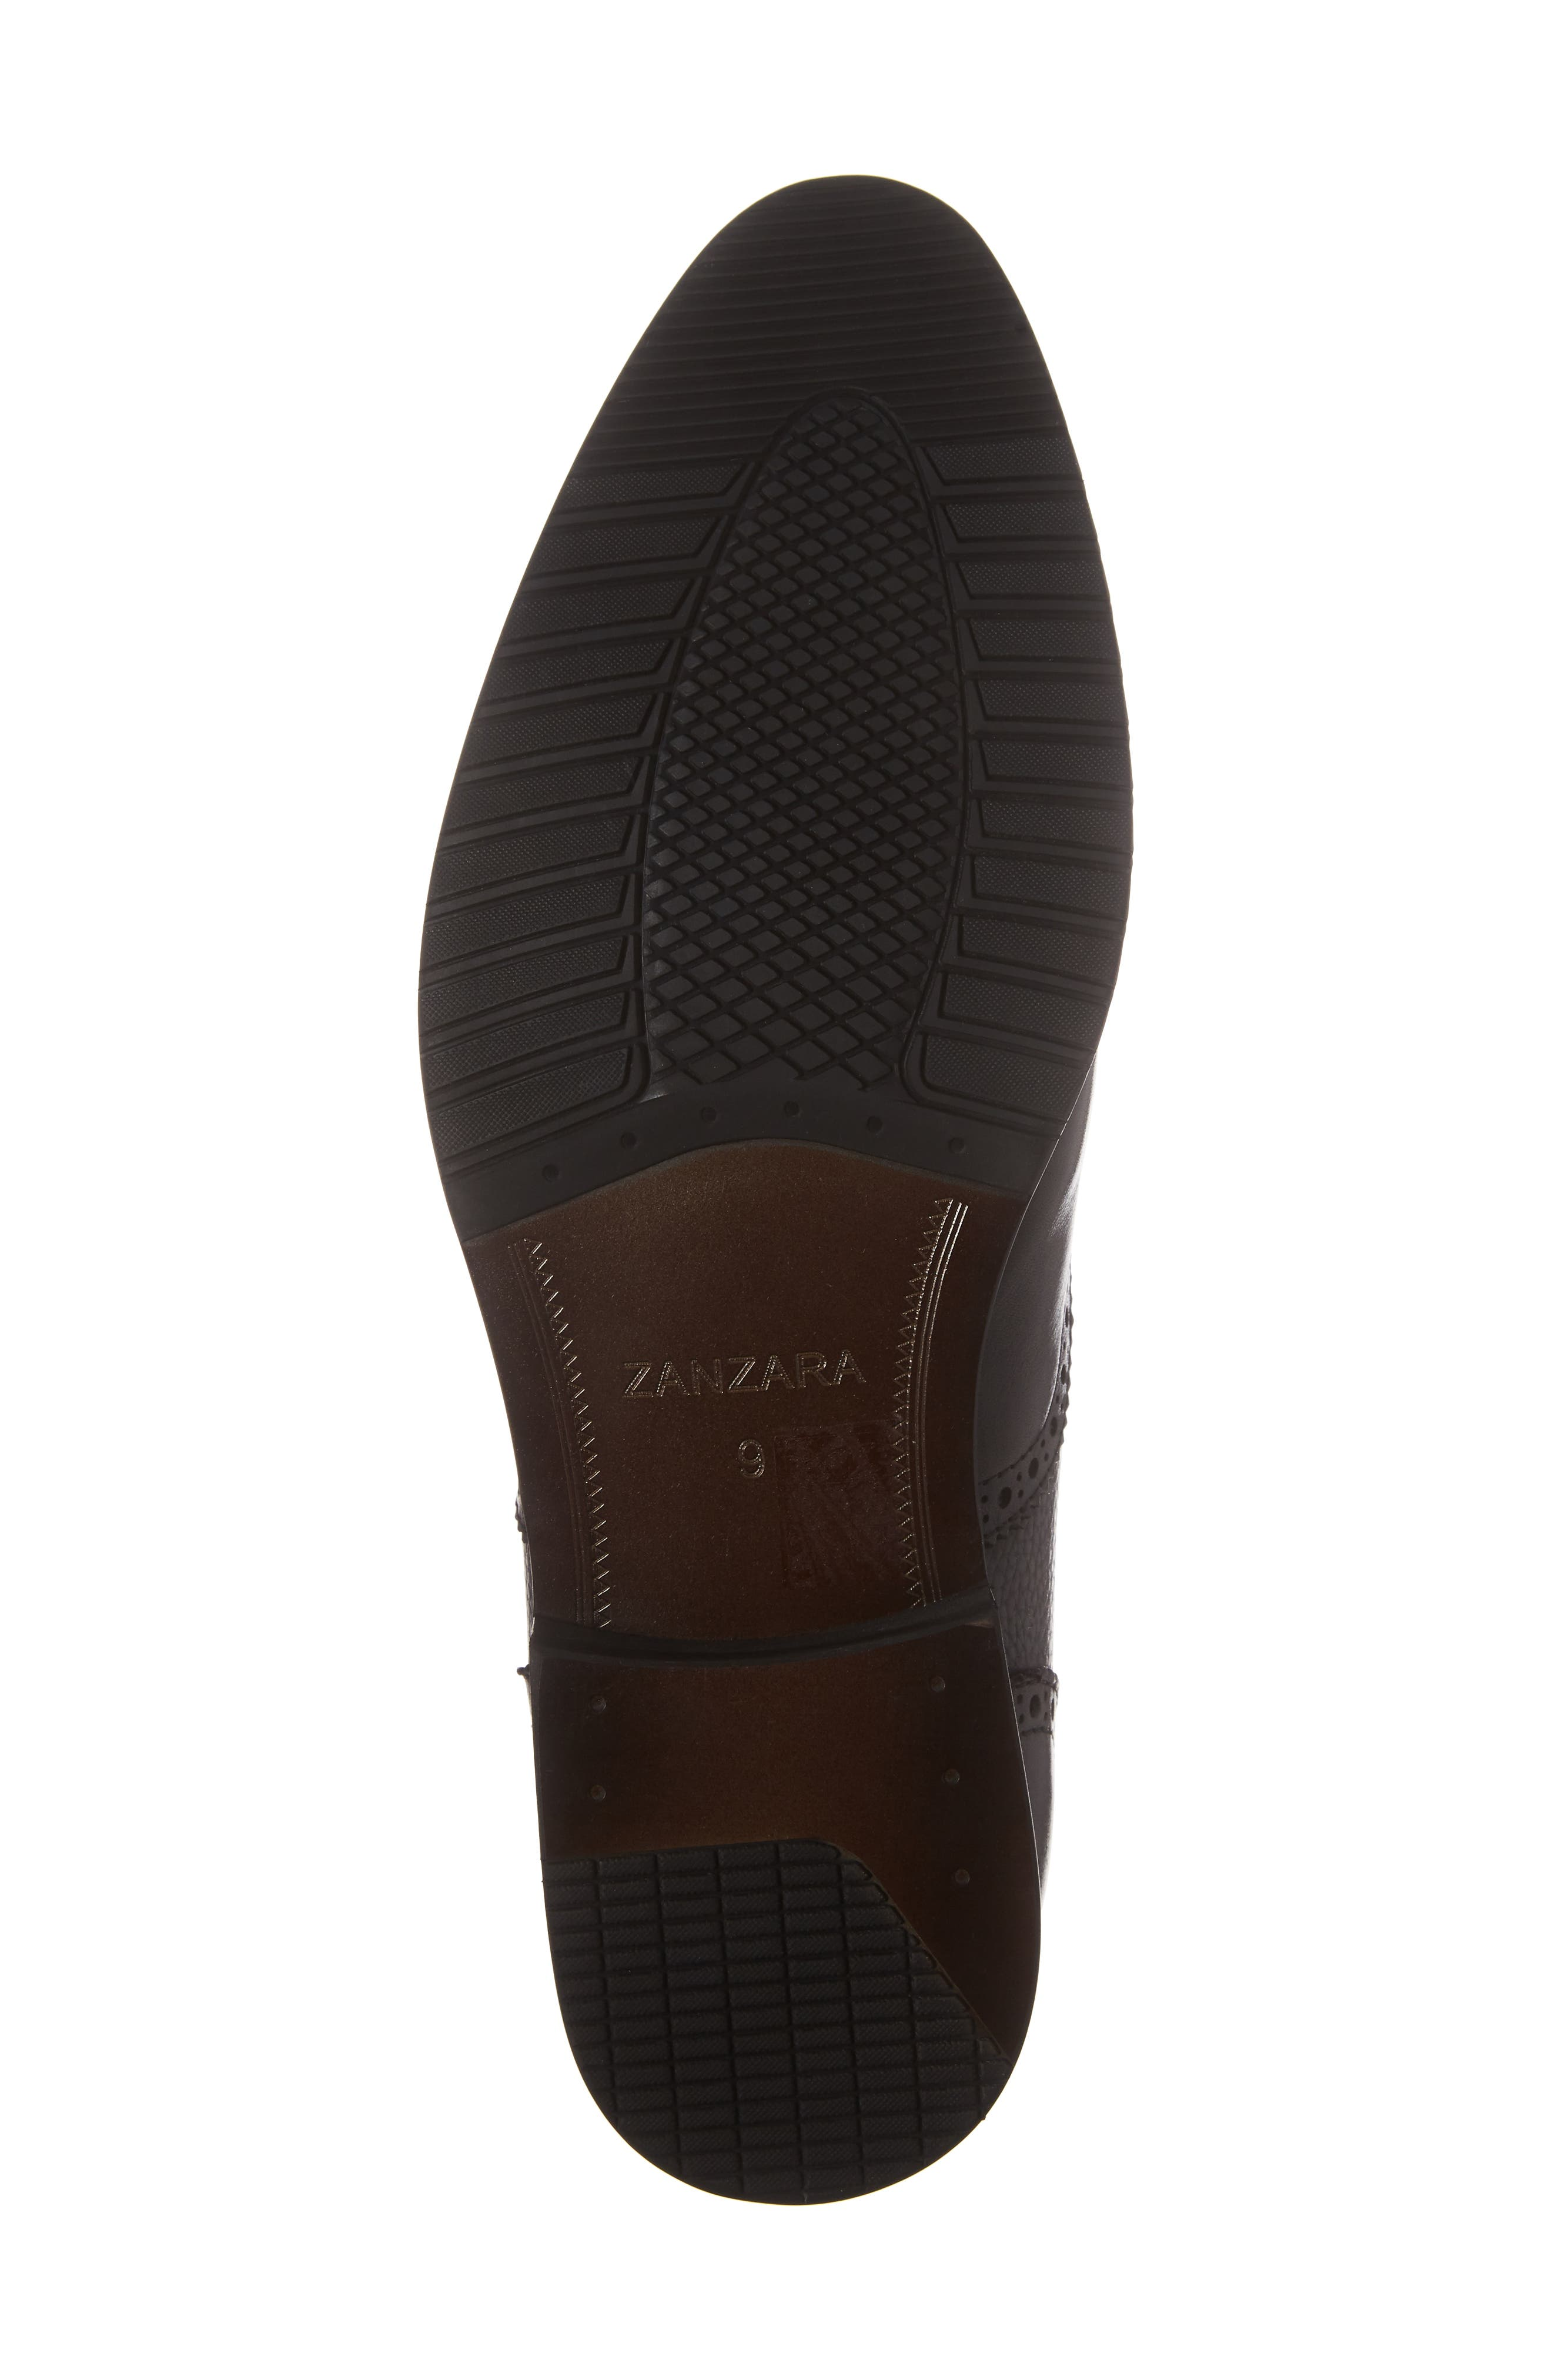 Hamel Chelsea Boot,                             Alternate thumbnail 6, color,                             Black Leather